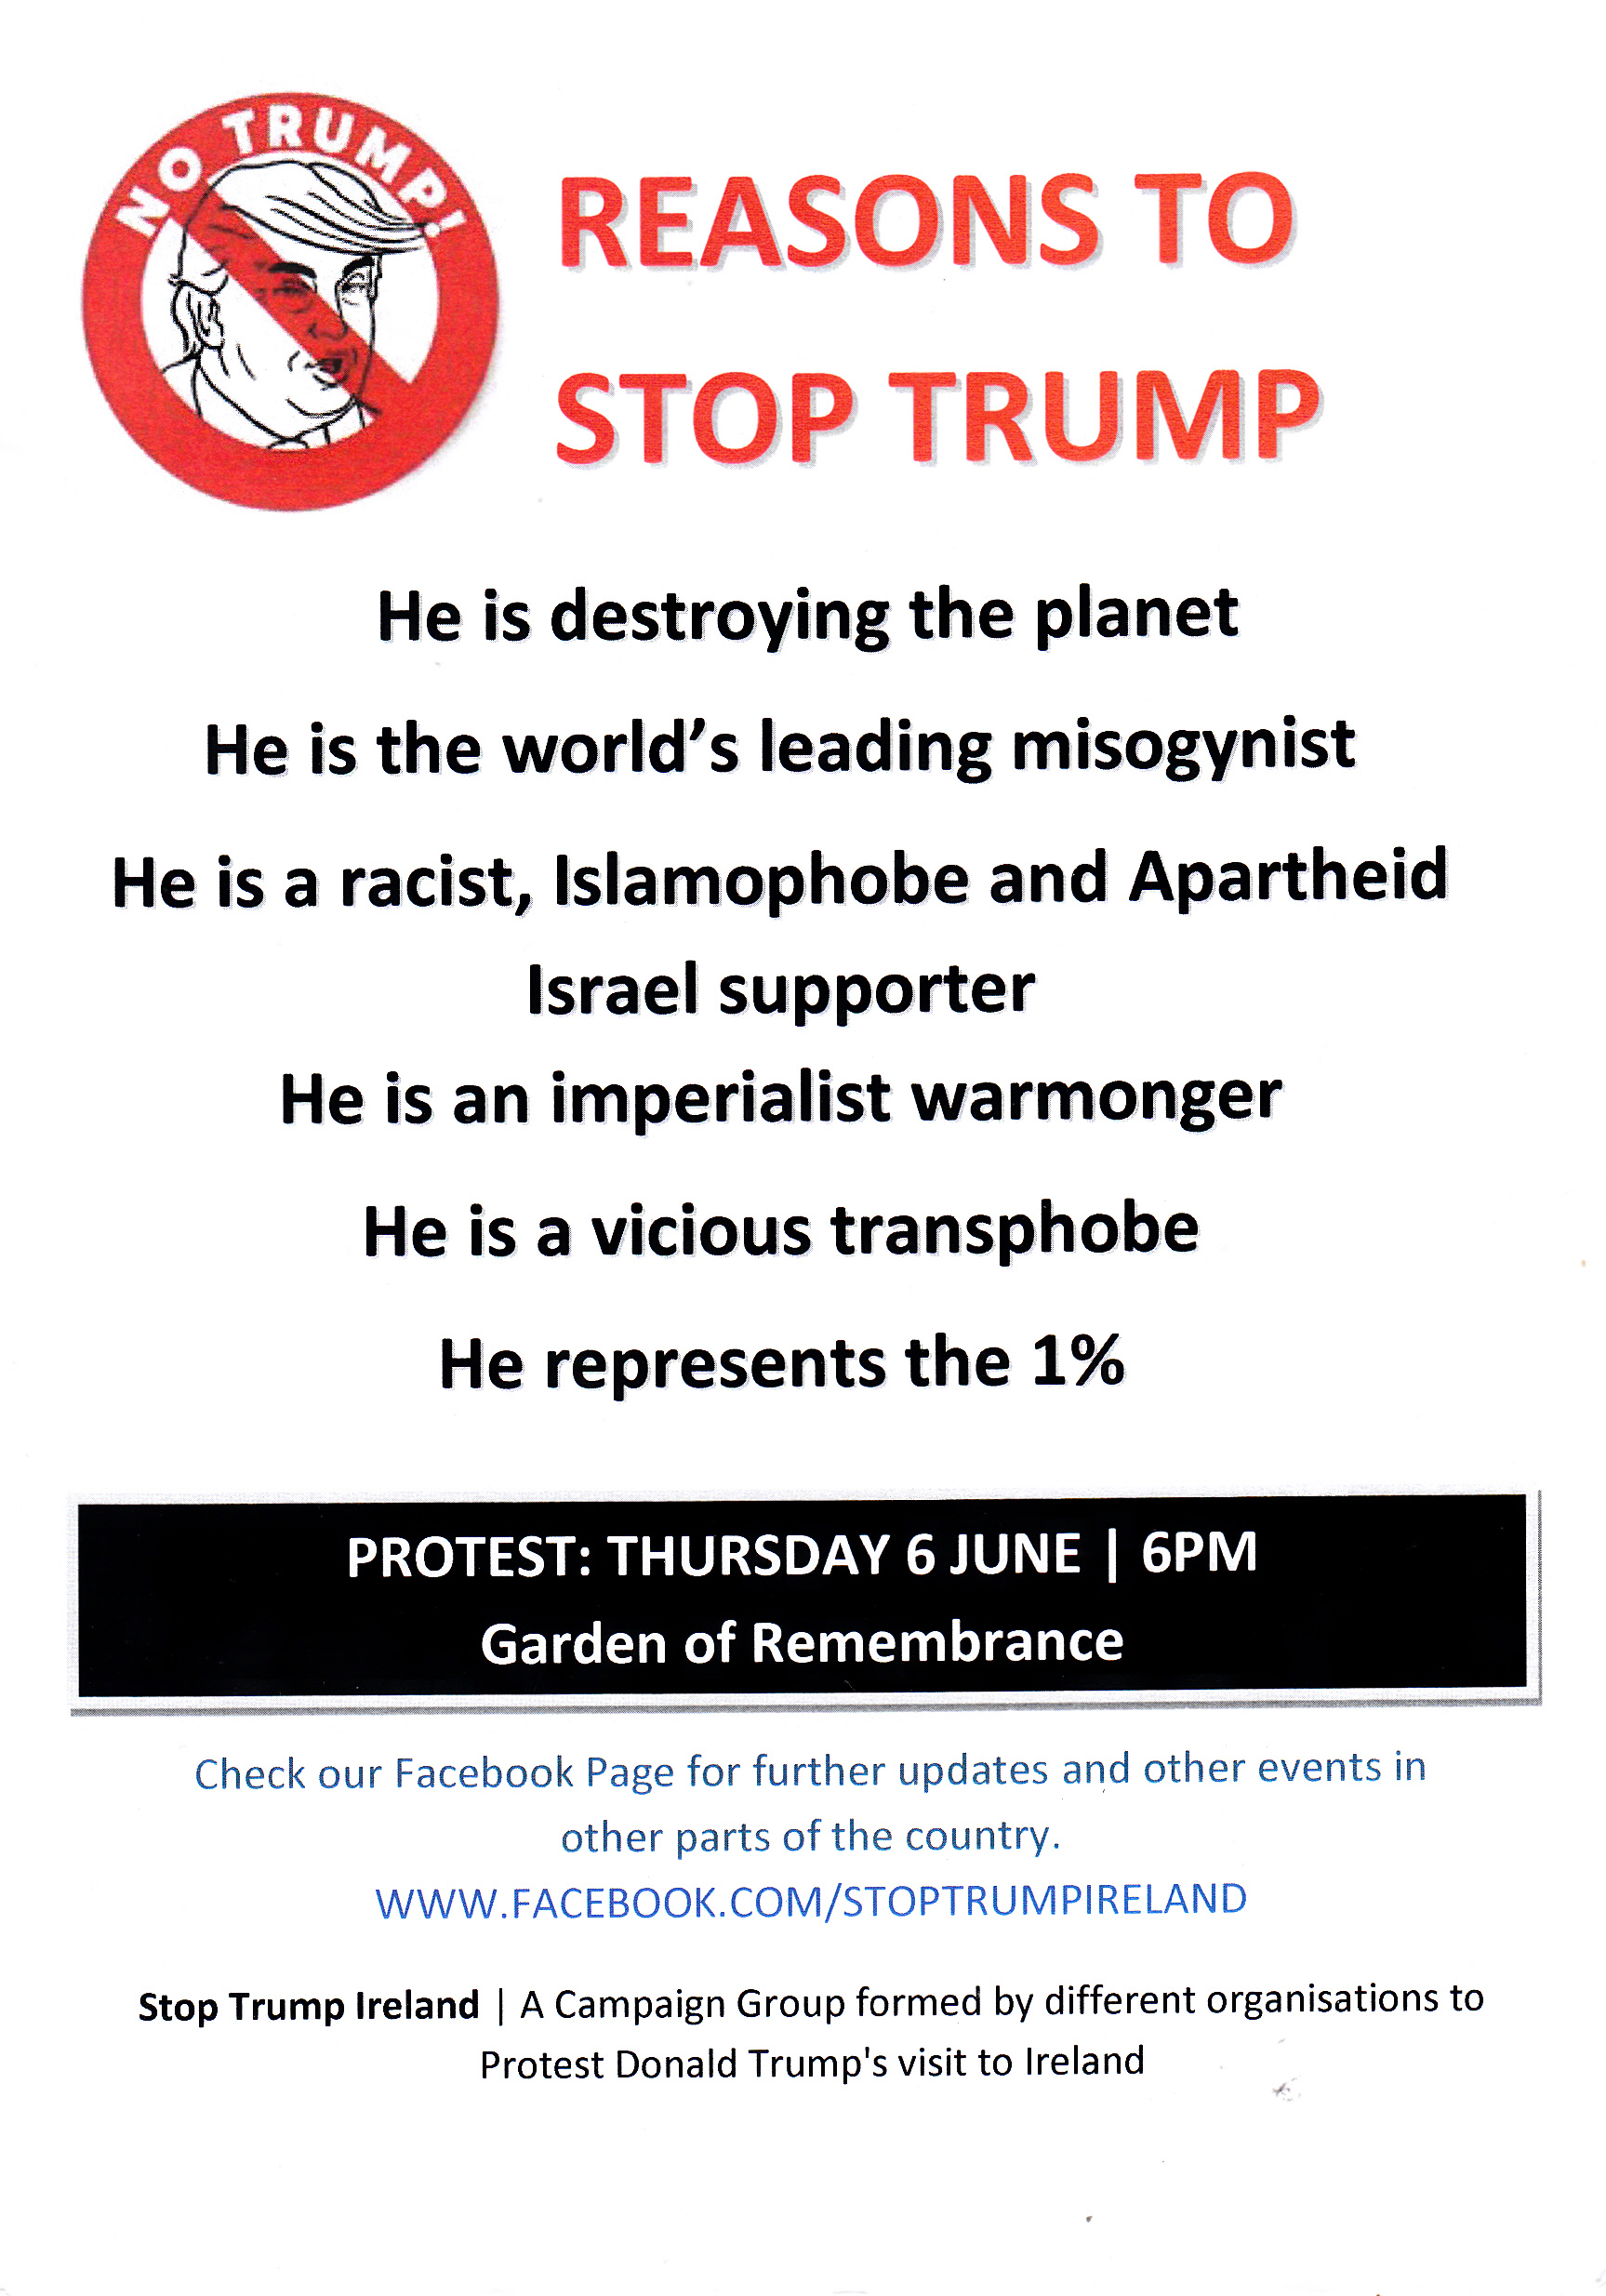 stop trump ireland_0001